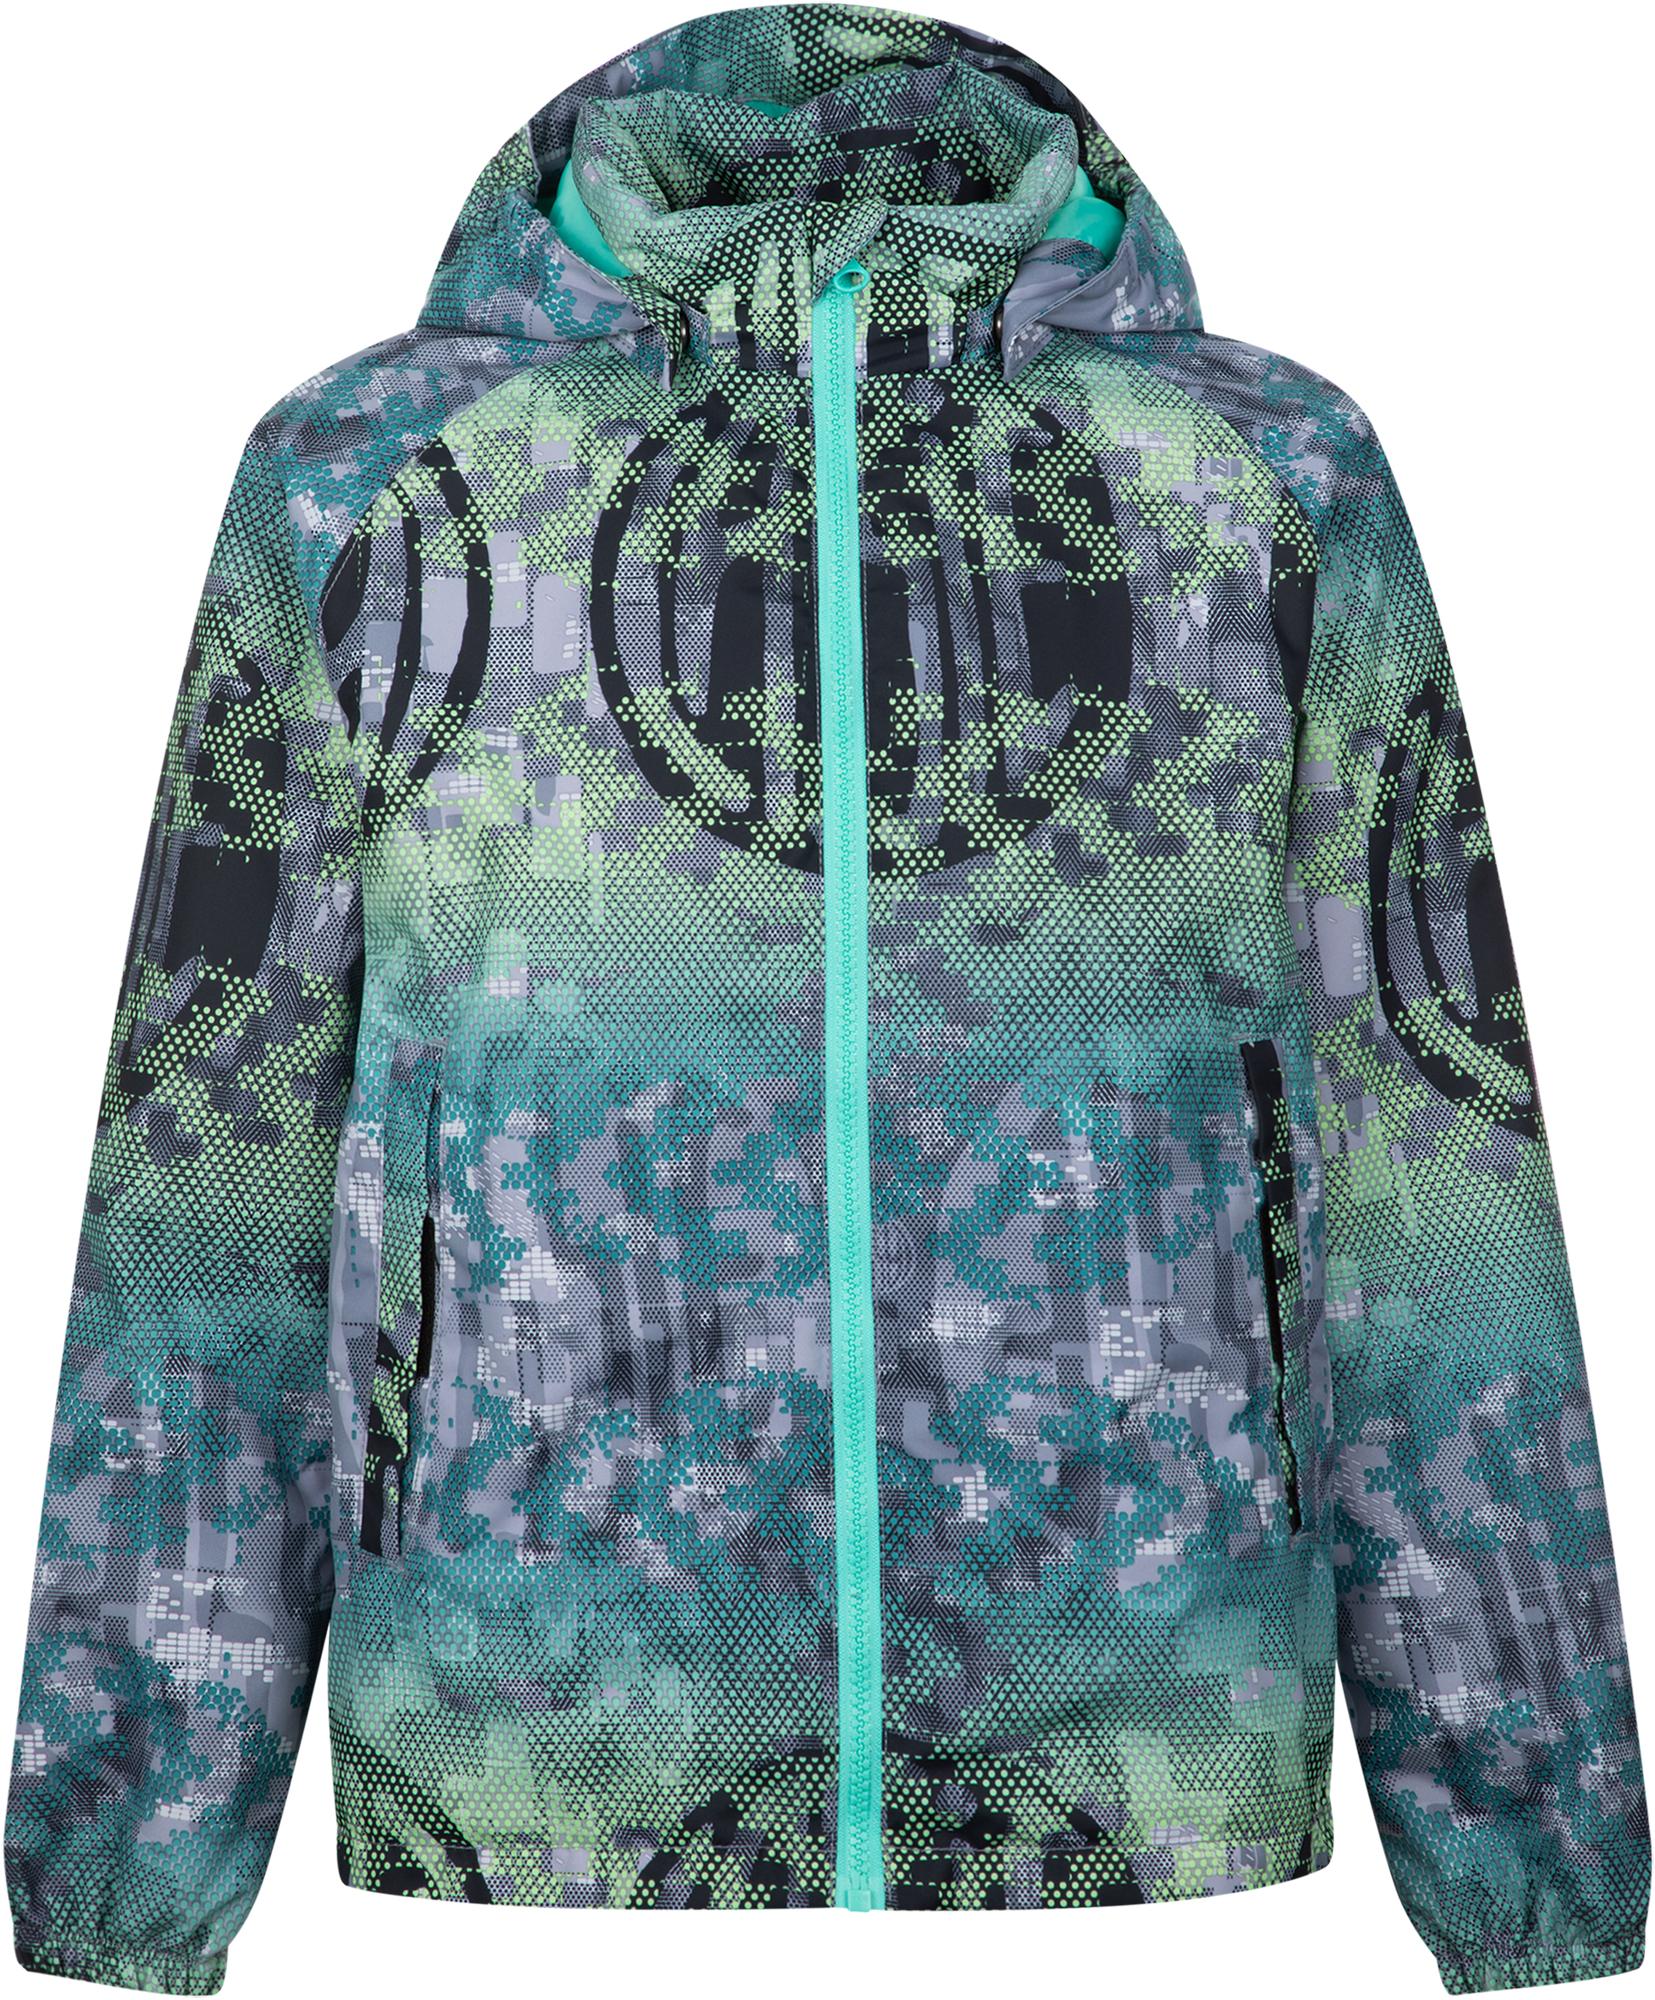 цена на Lassie Куртка утепленная для мальчиков LASSIE Kaspian, размер 122